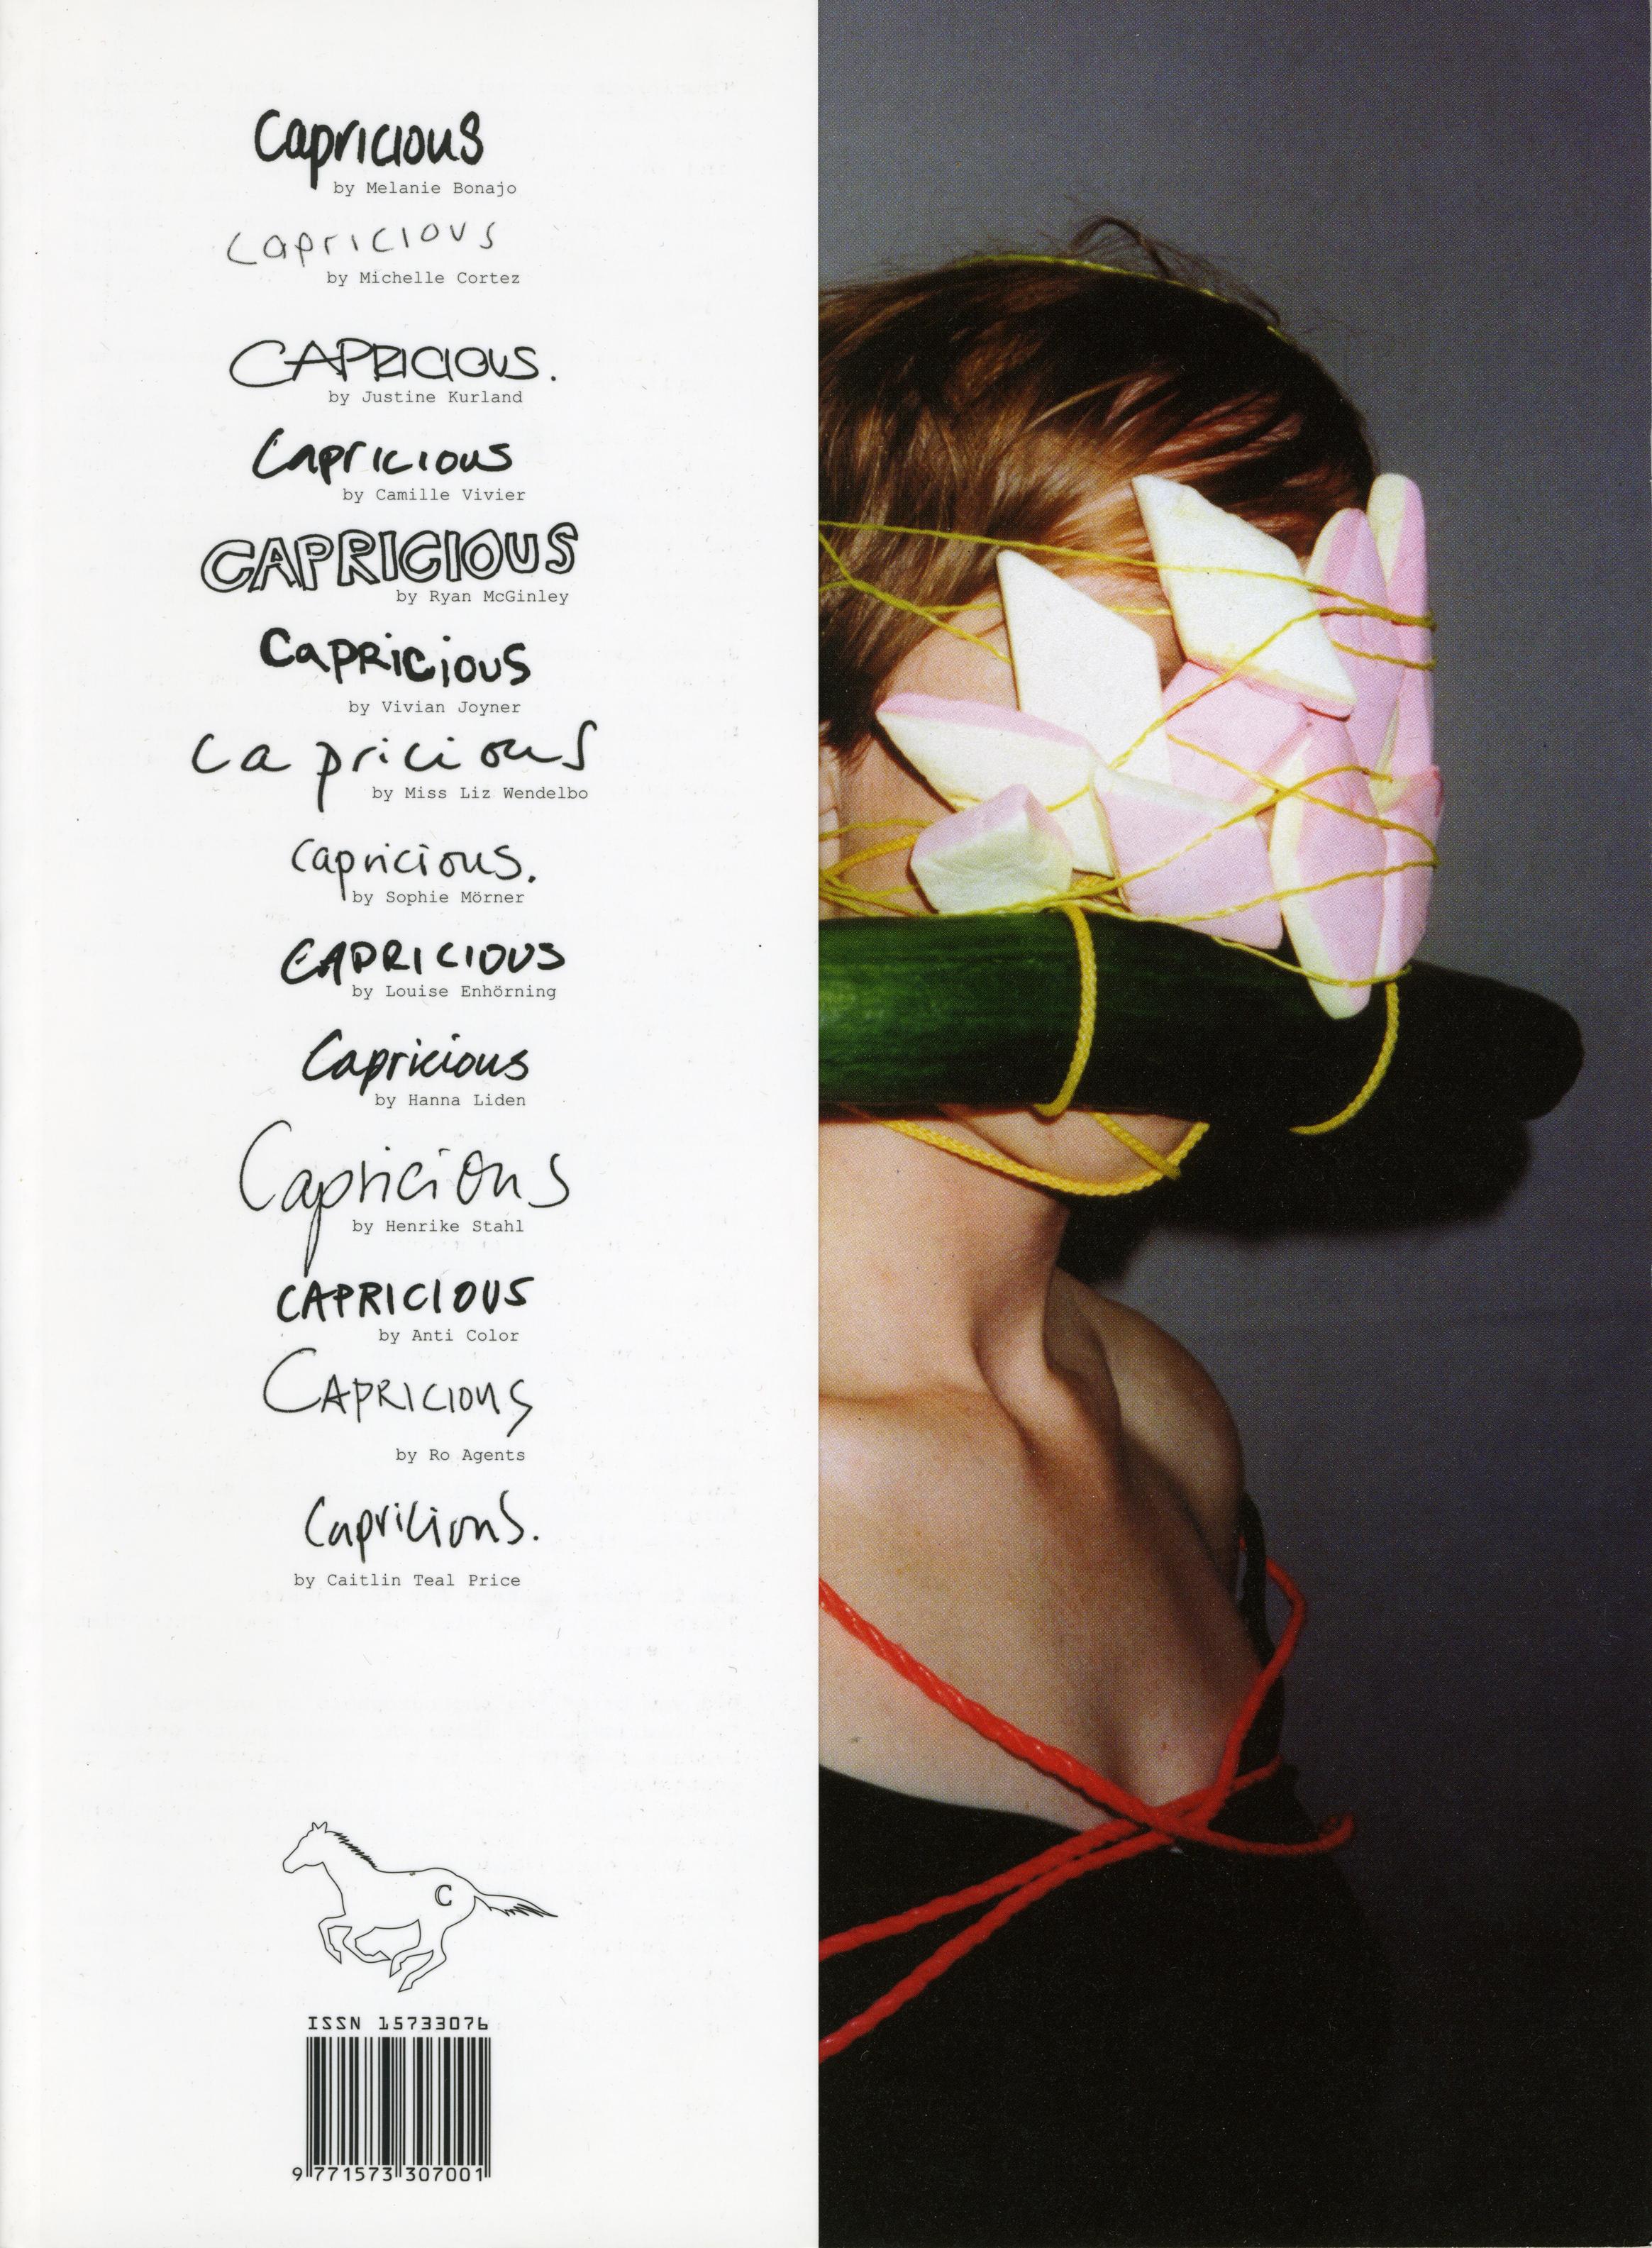 Capricious_1_Cover.jpg